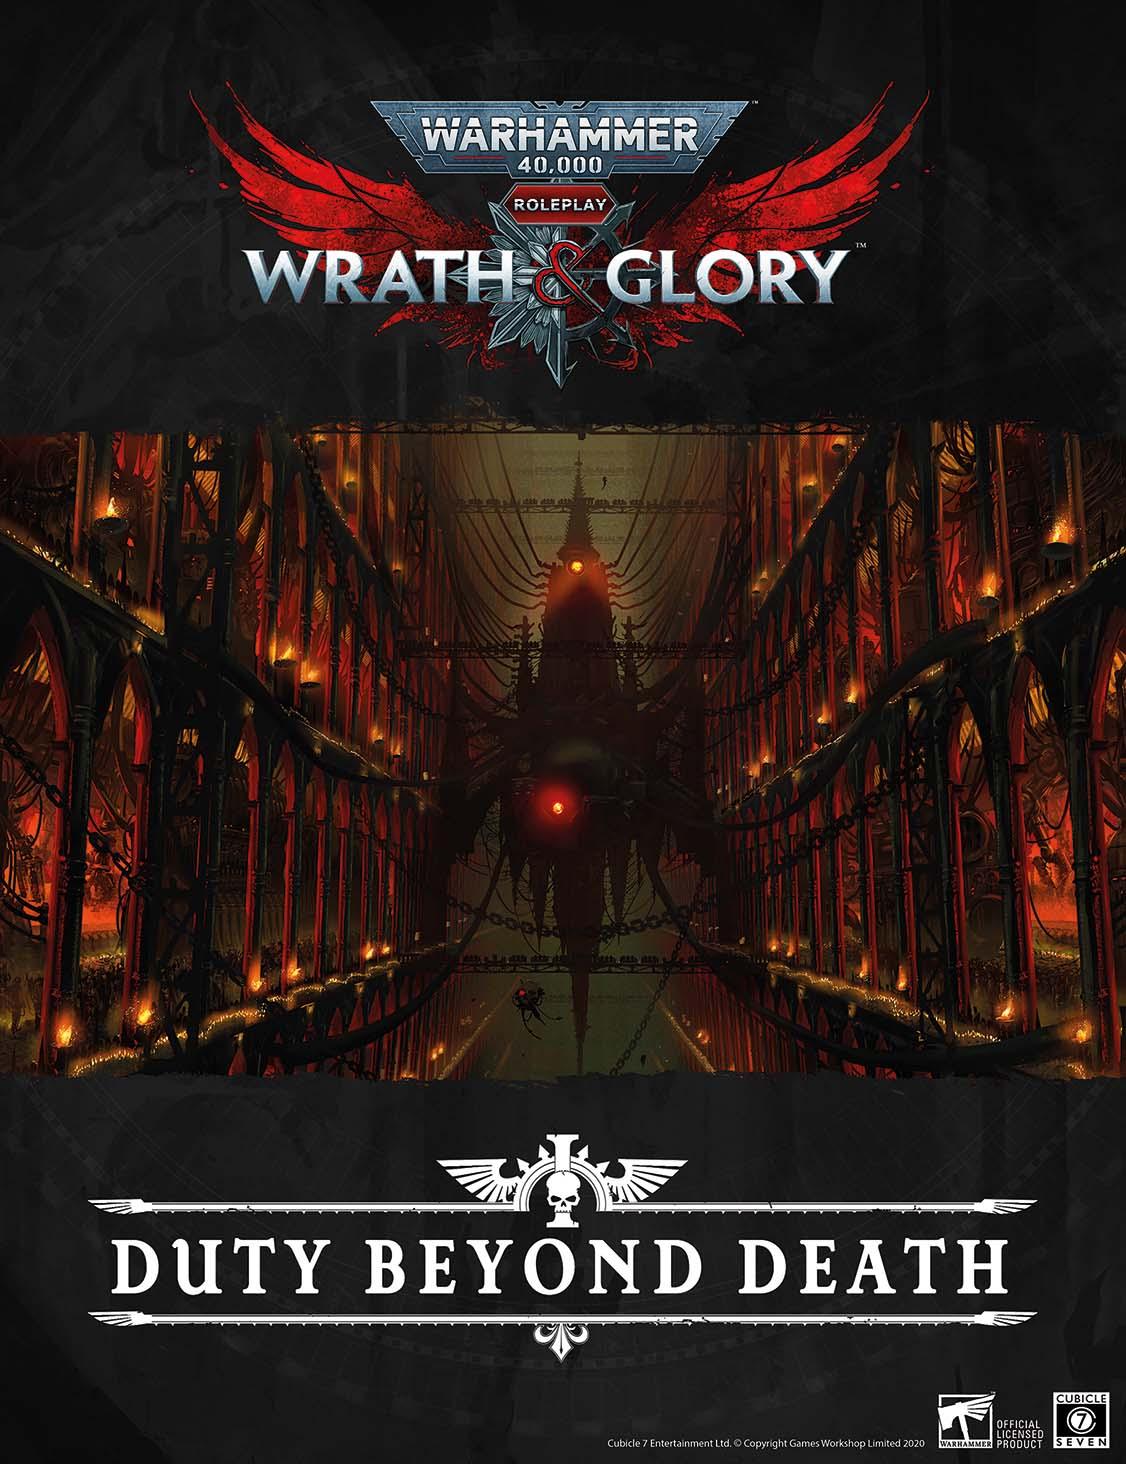 WG_LotL_Duty-Beyond-Death-Cover-4.jpg